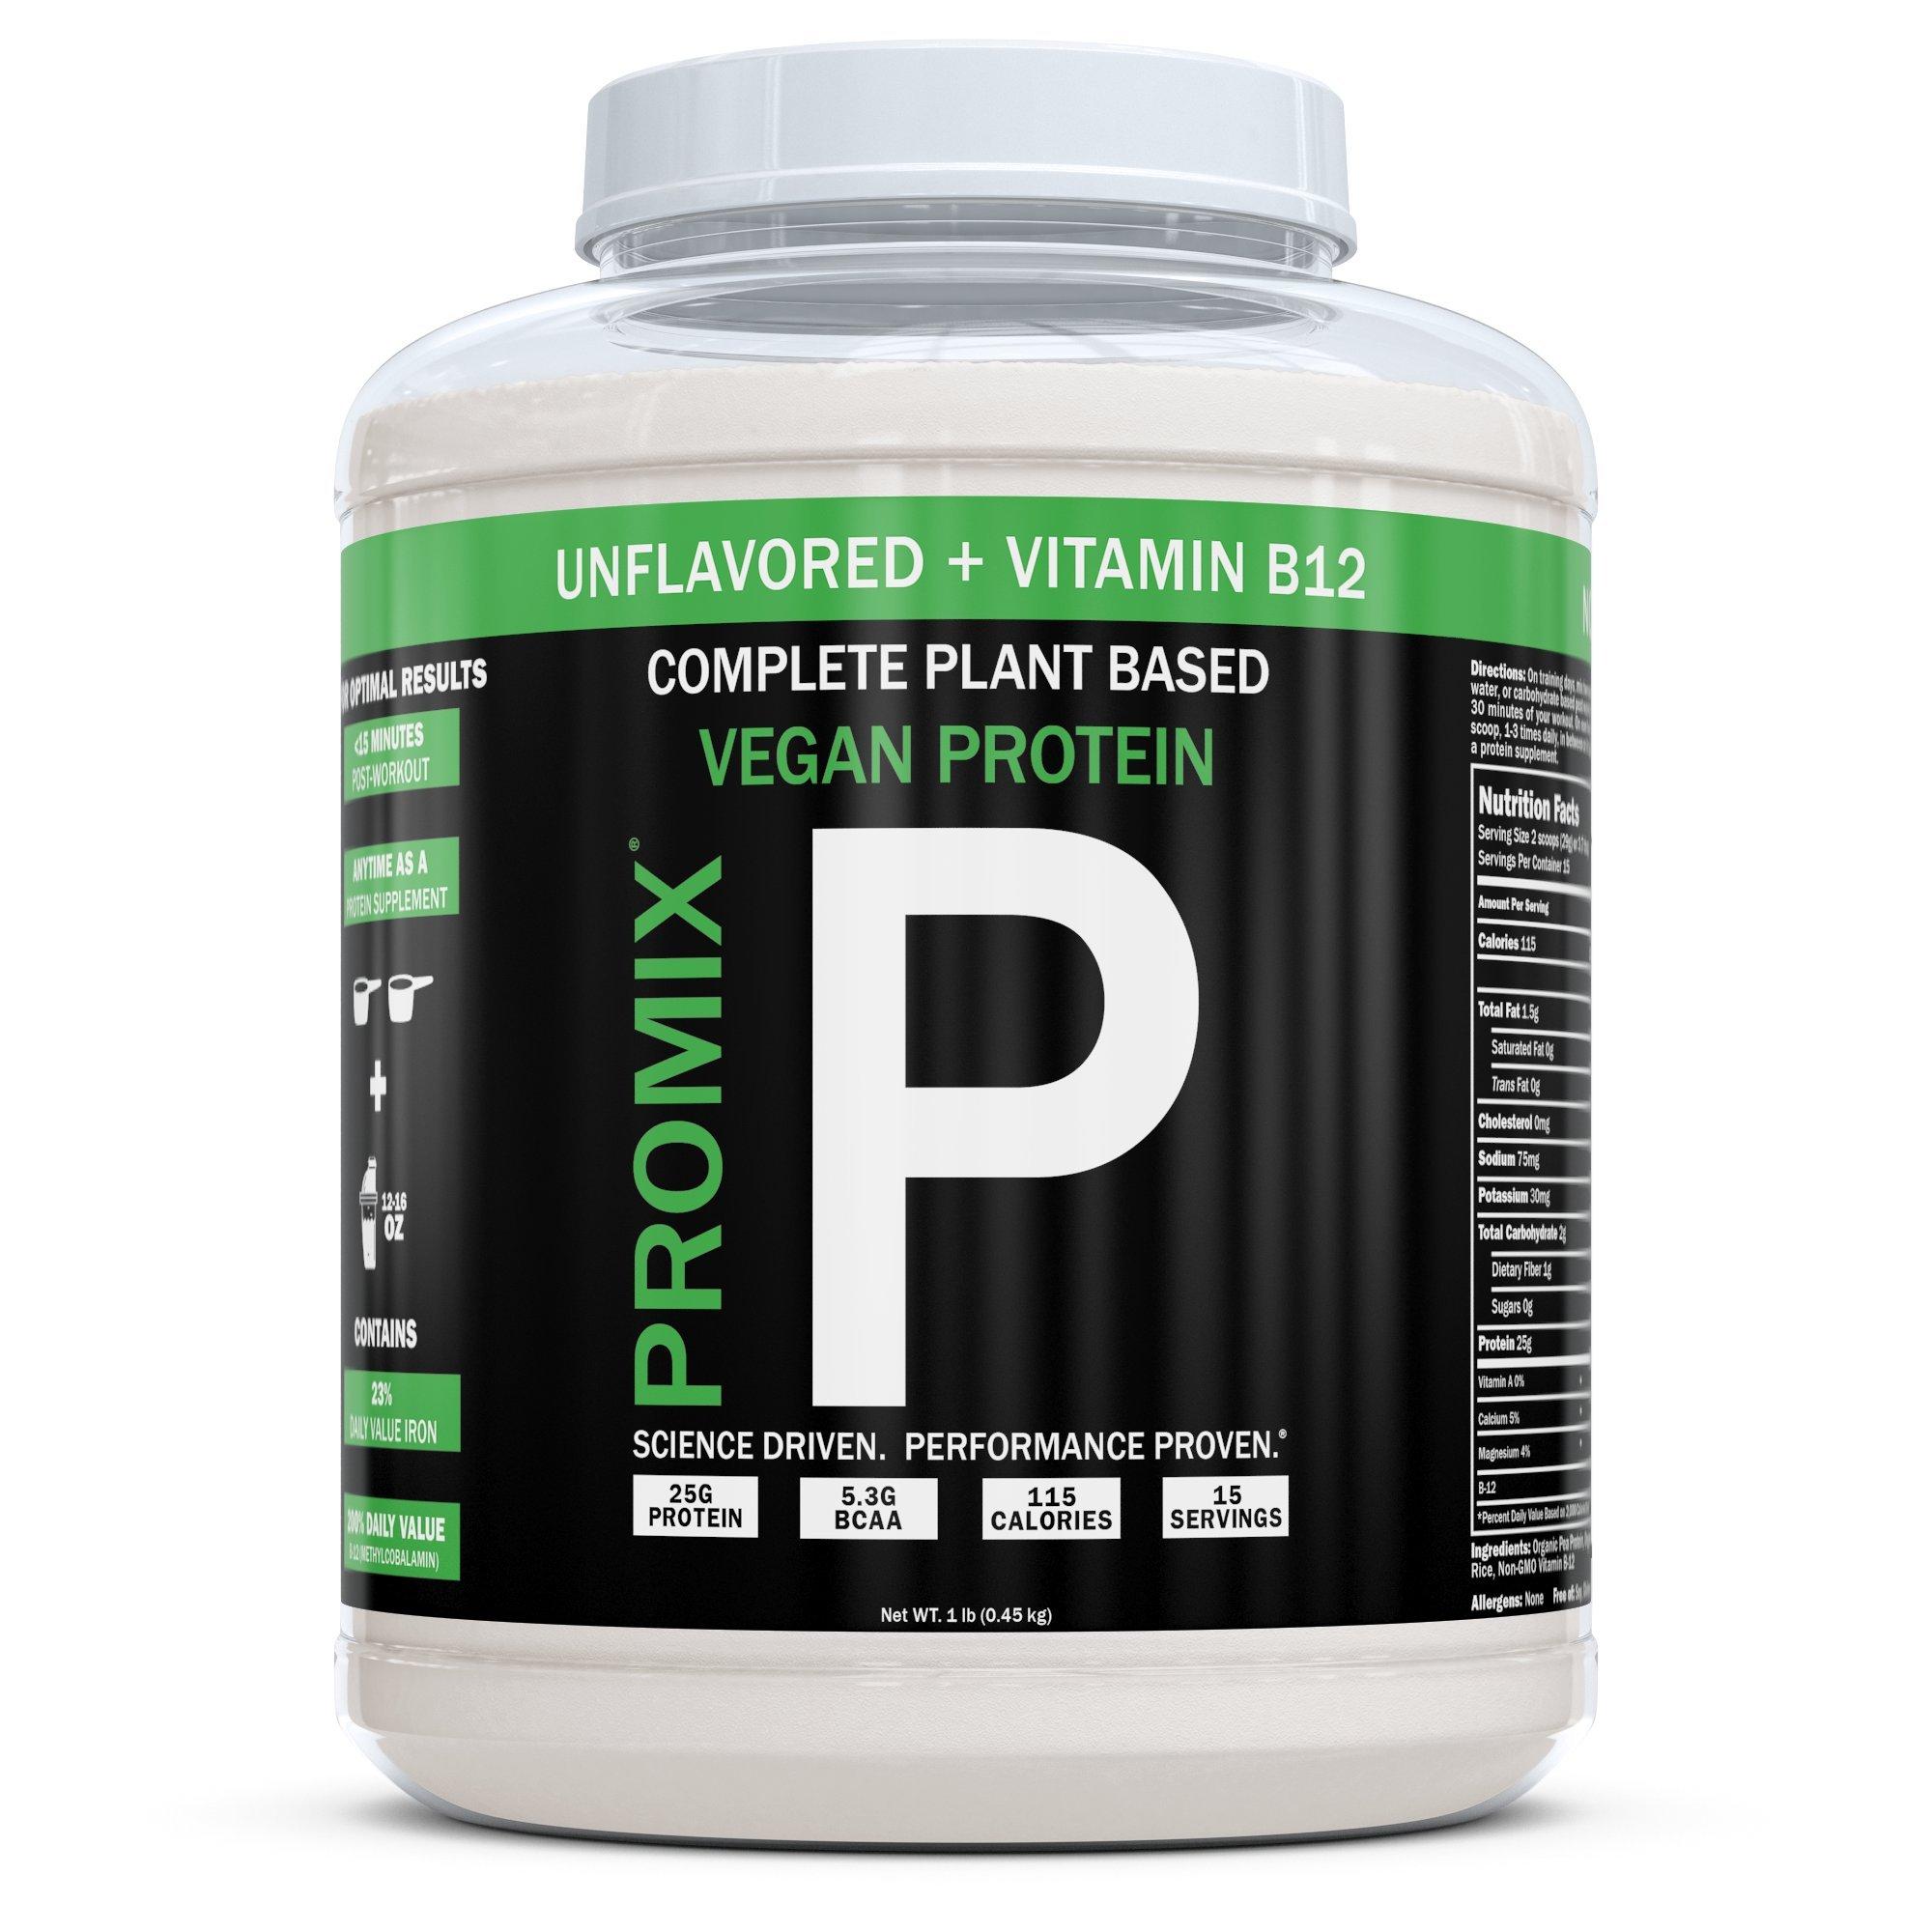 PROMIX Vegan Protein Powder | Dairy Free, Non GMO, Gluten Free, Organic (1 Pound, Vegan + B12) by ProMix Nutrition